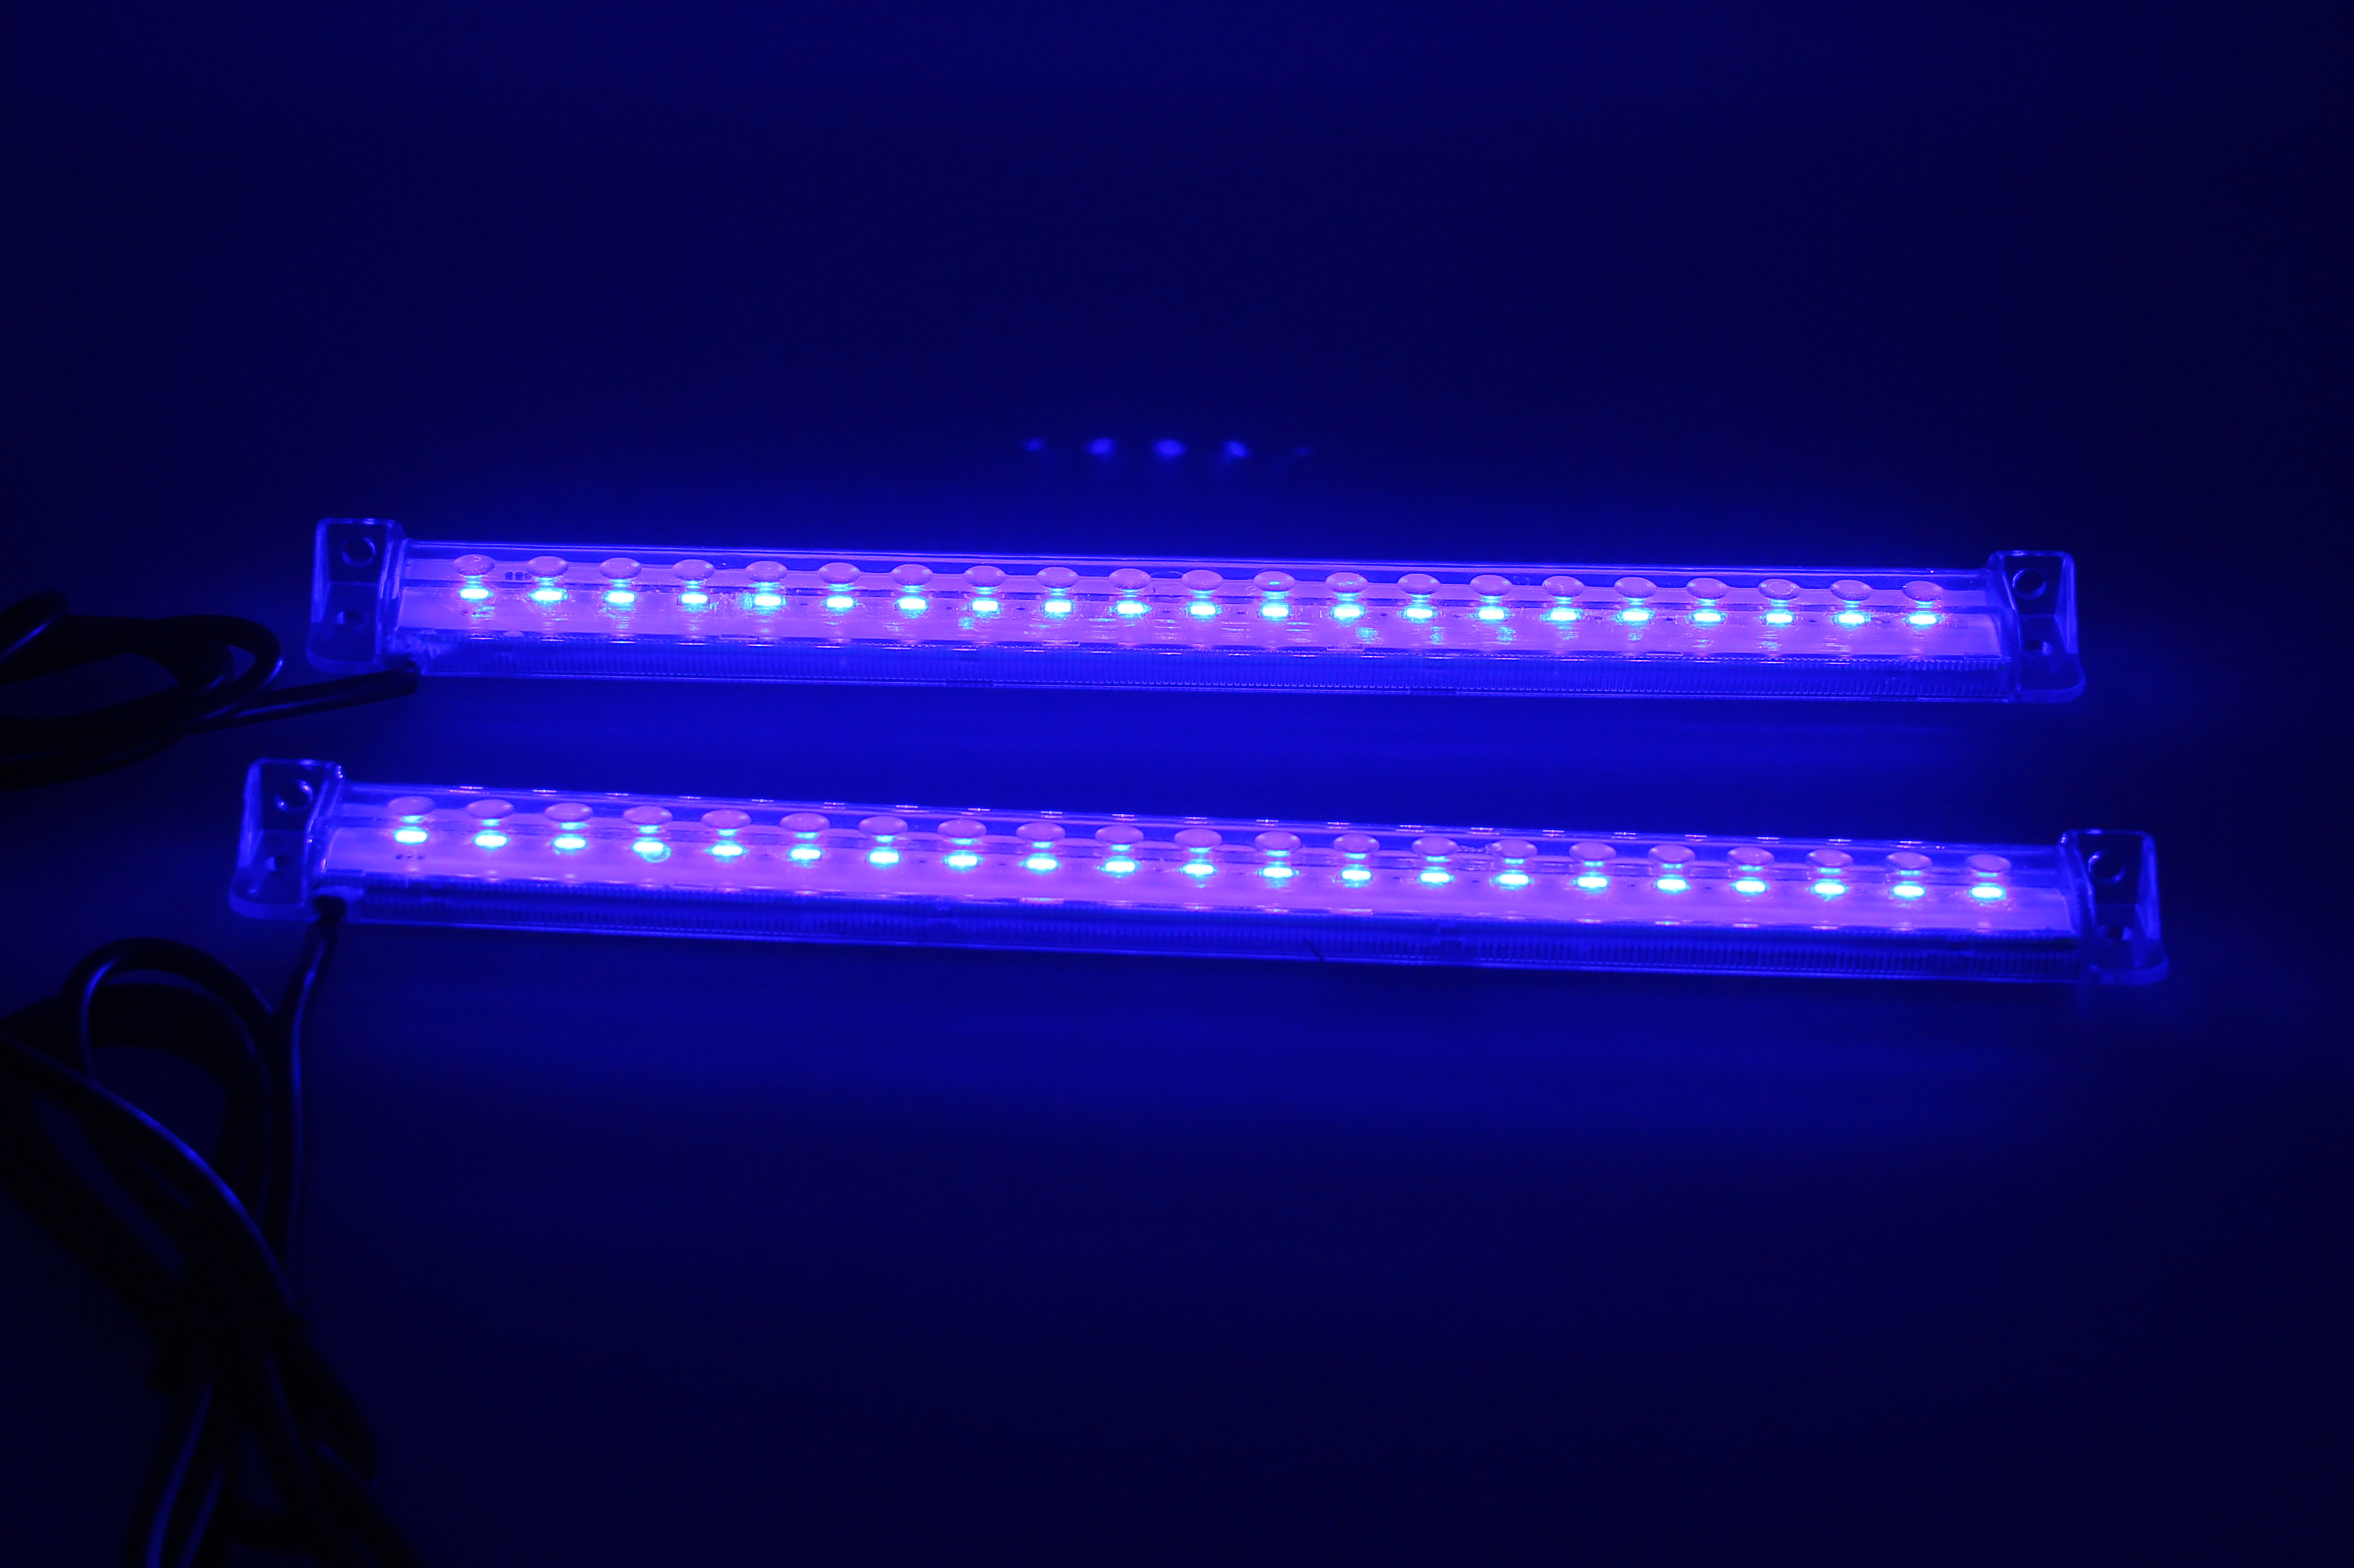 2x 21 Led 12v Trim Tab Transom Light Bar Blue Boat